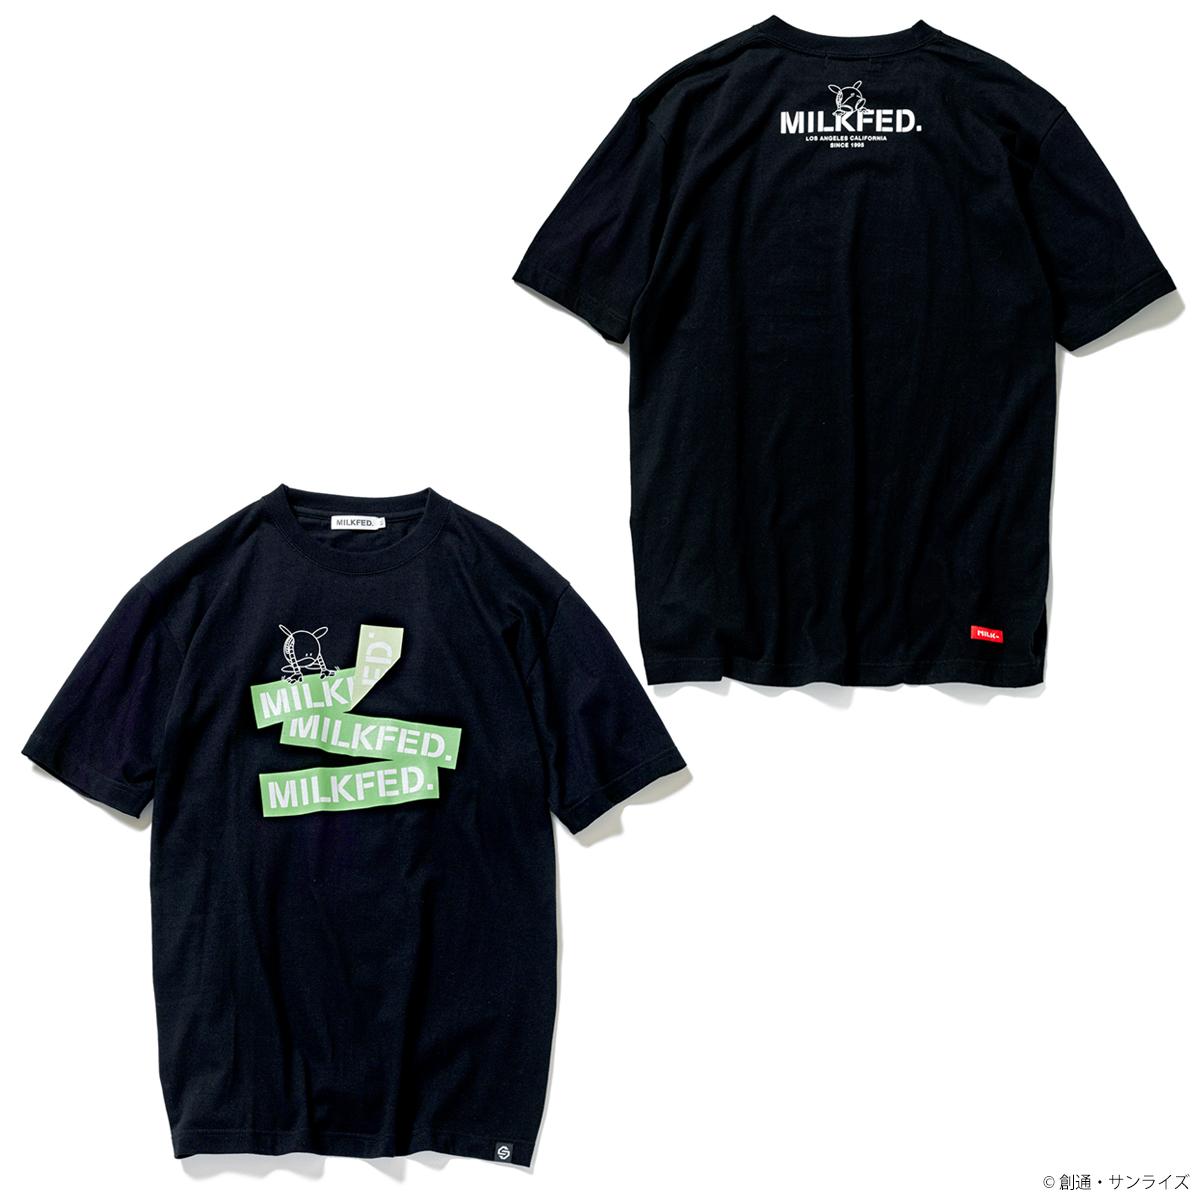 STRICT-G MILKFED.『機動戦士ガンダム』 Tシャツ ハロ グリーンBARロゴ